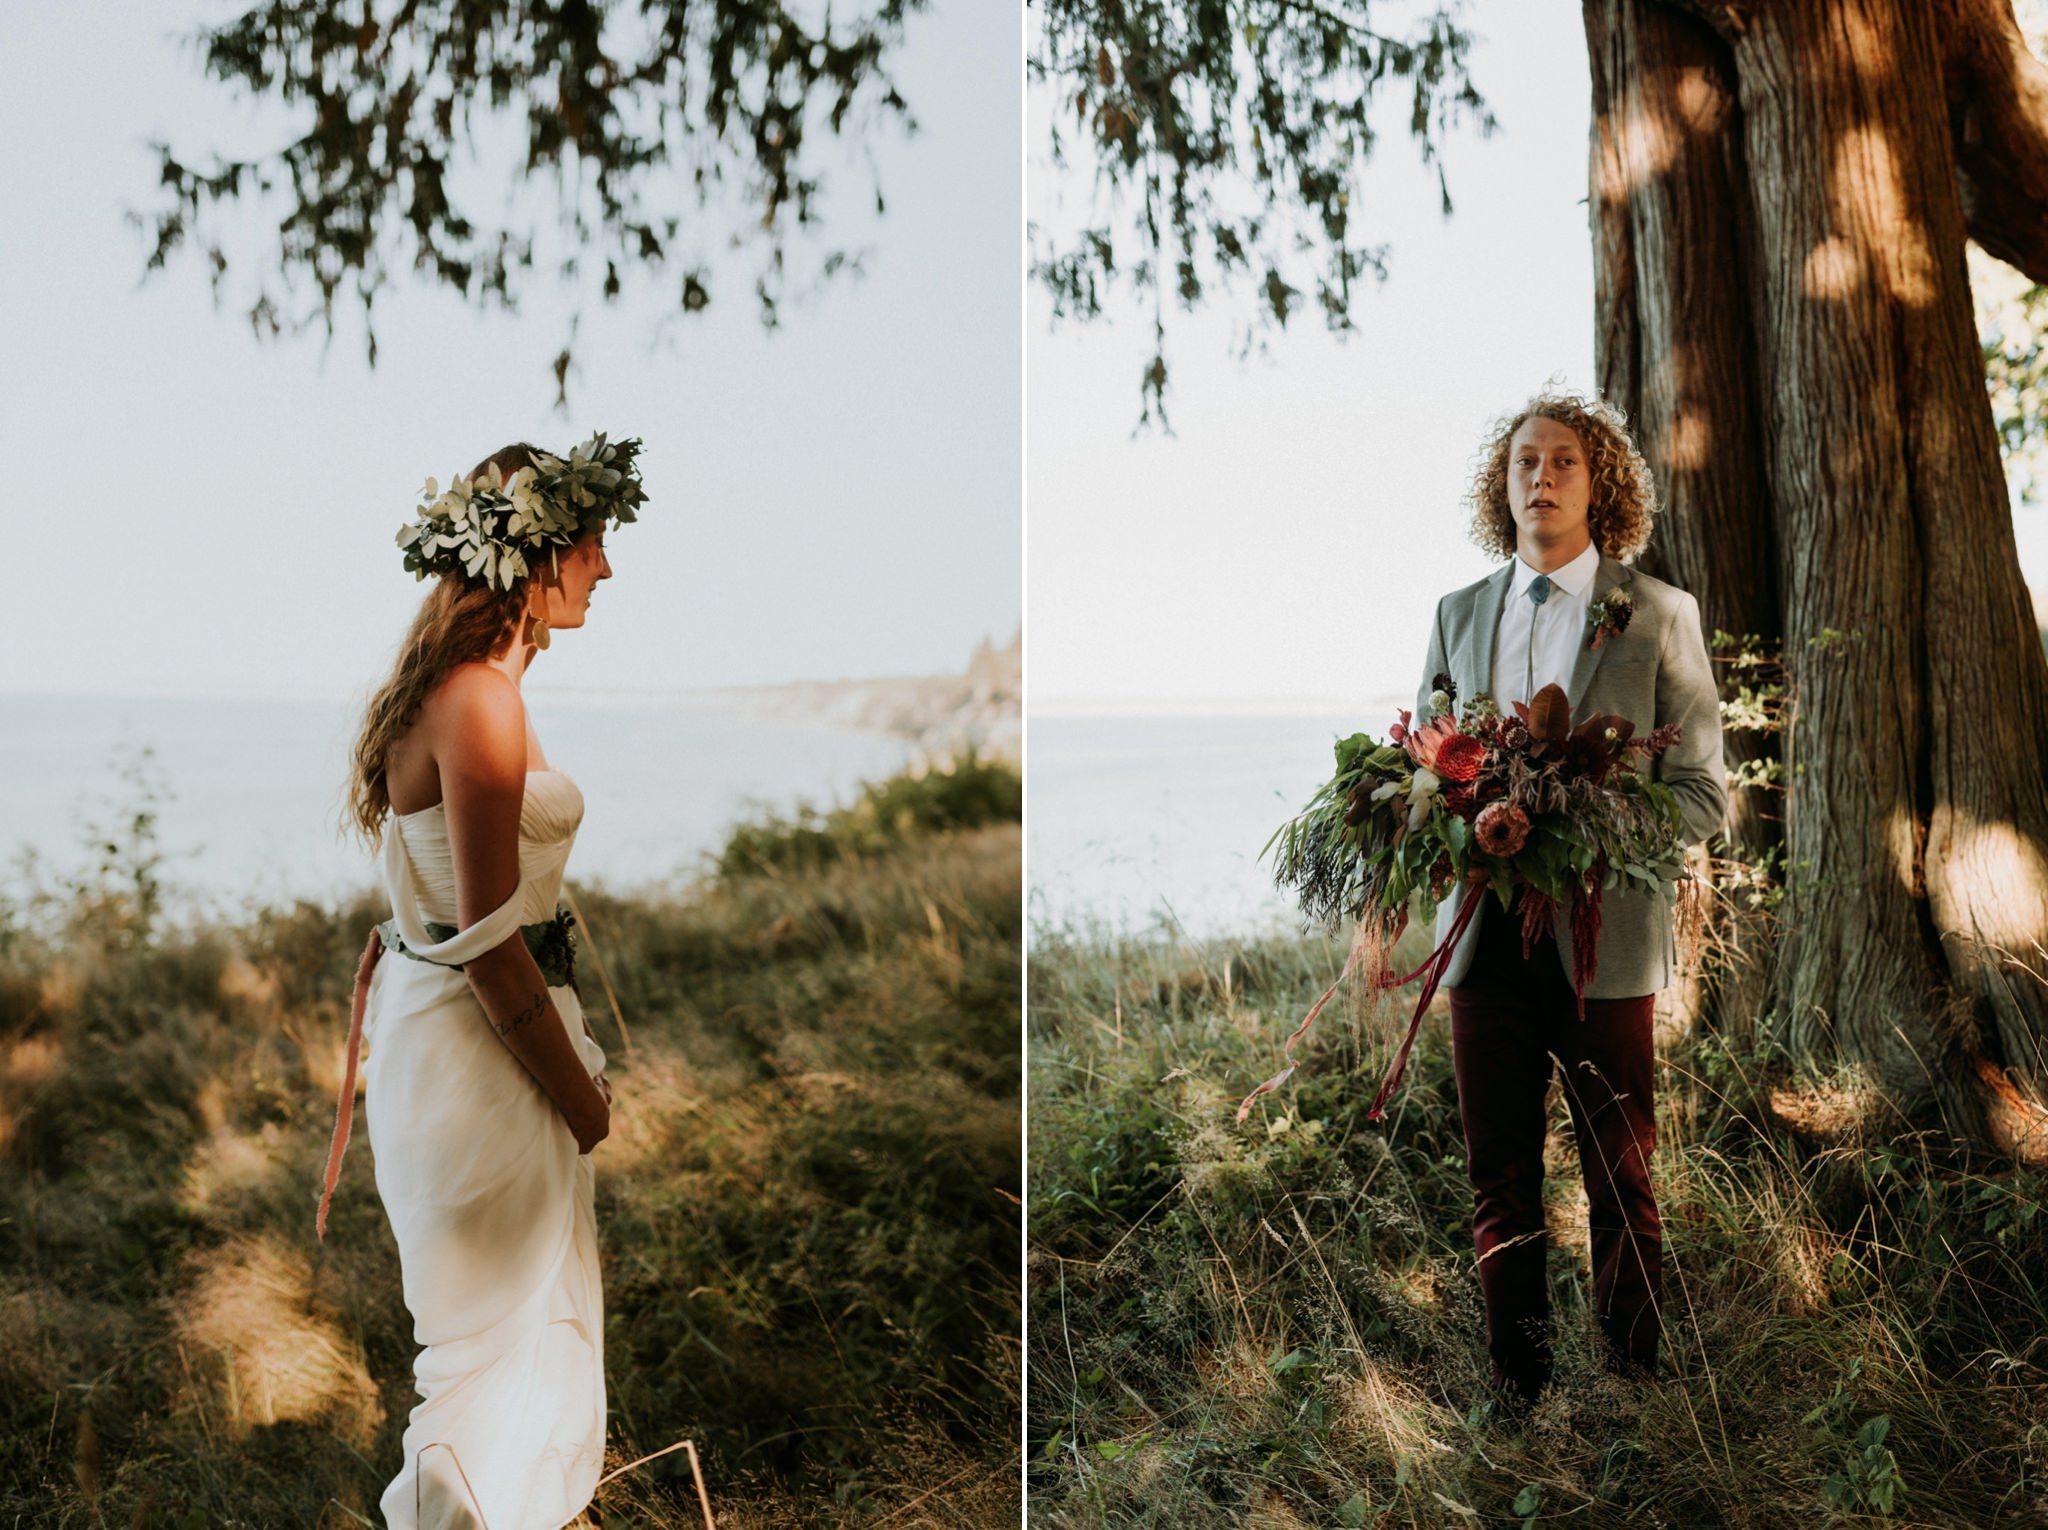 magical-bohemian-barnhouse-greenery-port-angeles-washington-forest-seaside-grassy-wedding-Kerlyn-Van-Gelder-Photography-Washington-Wedding-Photographer